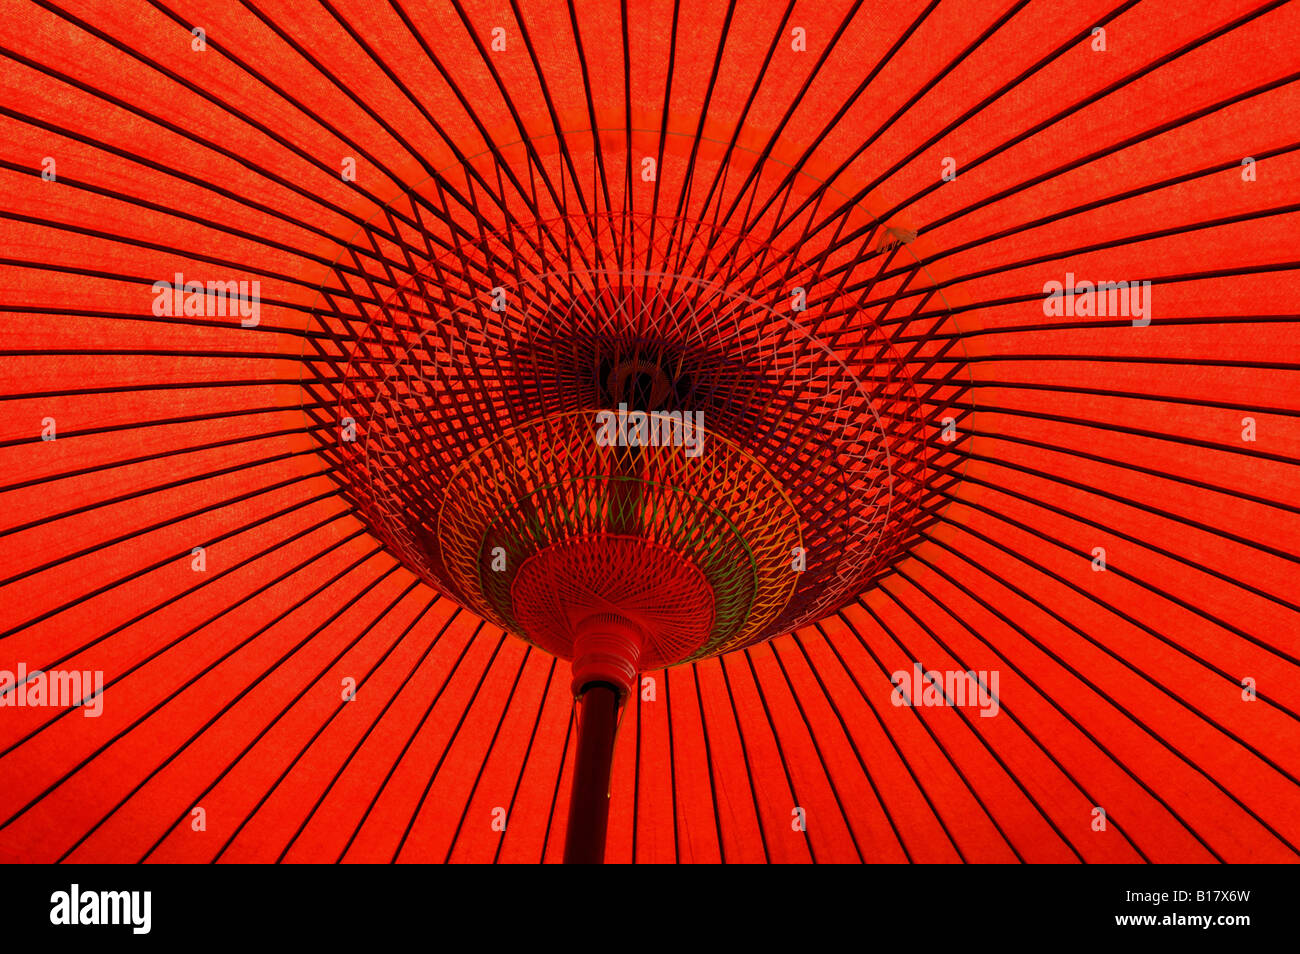 traditionelle japanische rotes Papier Regenschirm Kyoto Japan Stockbild